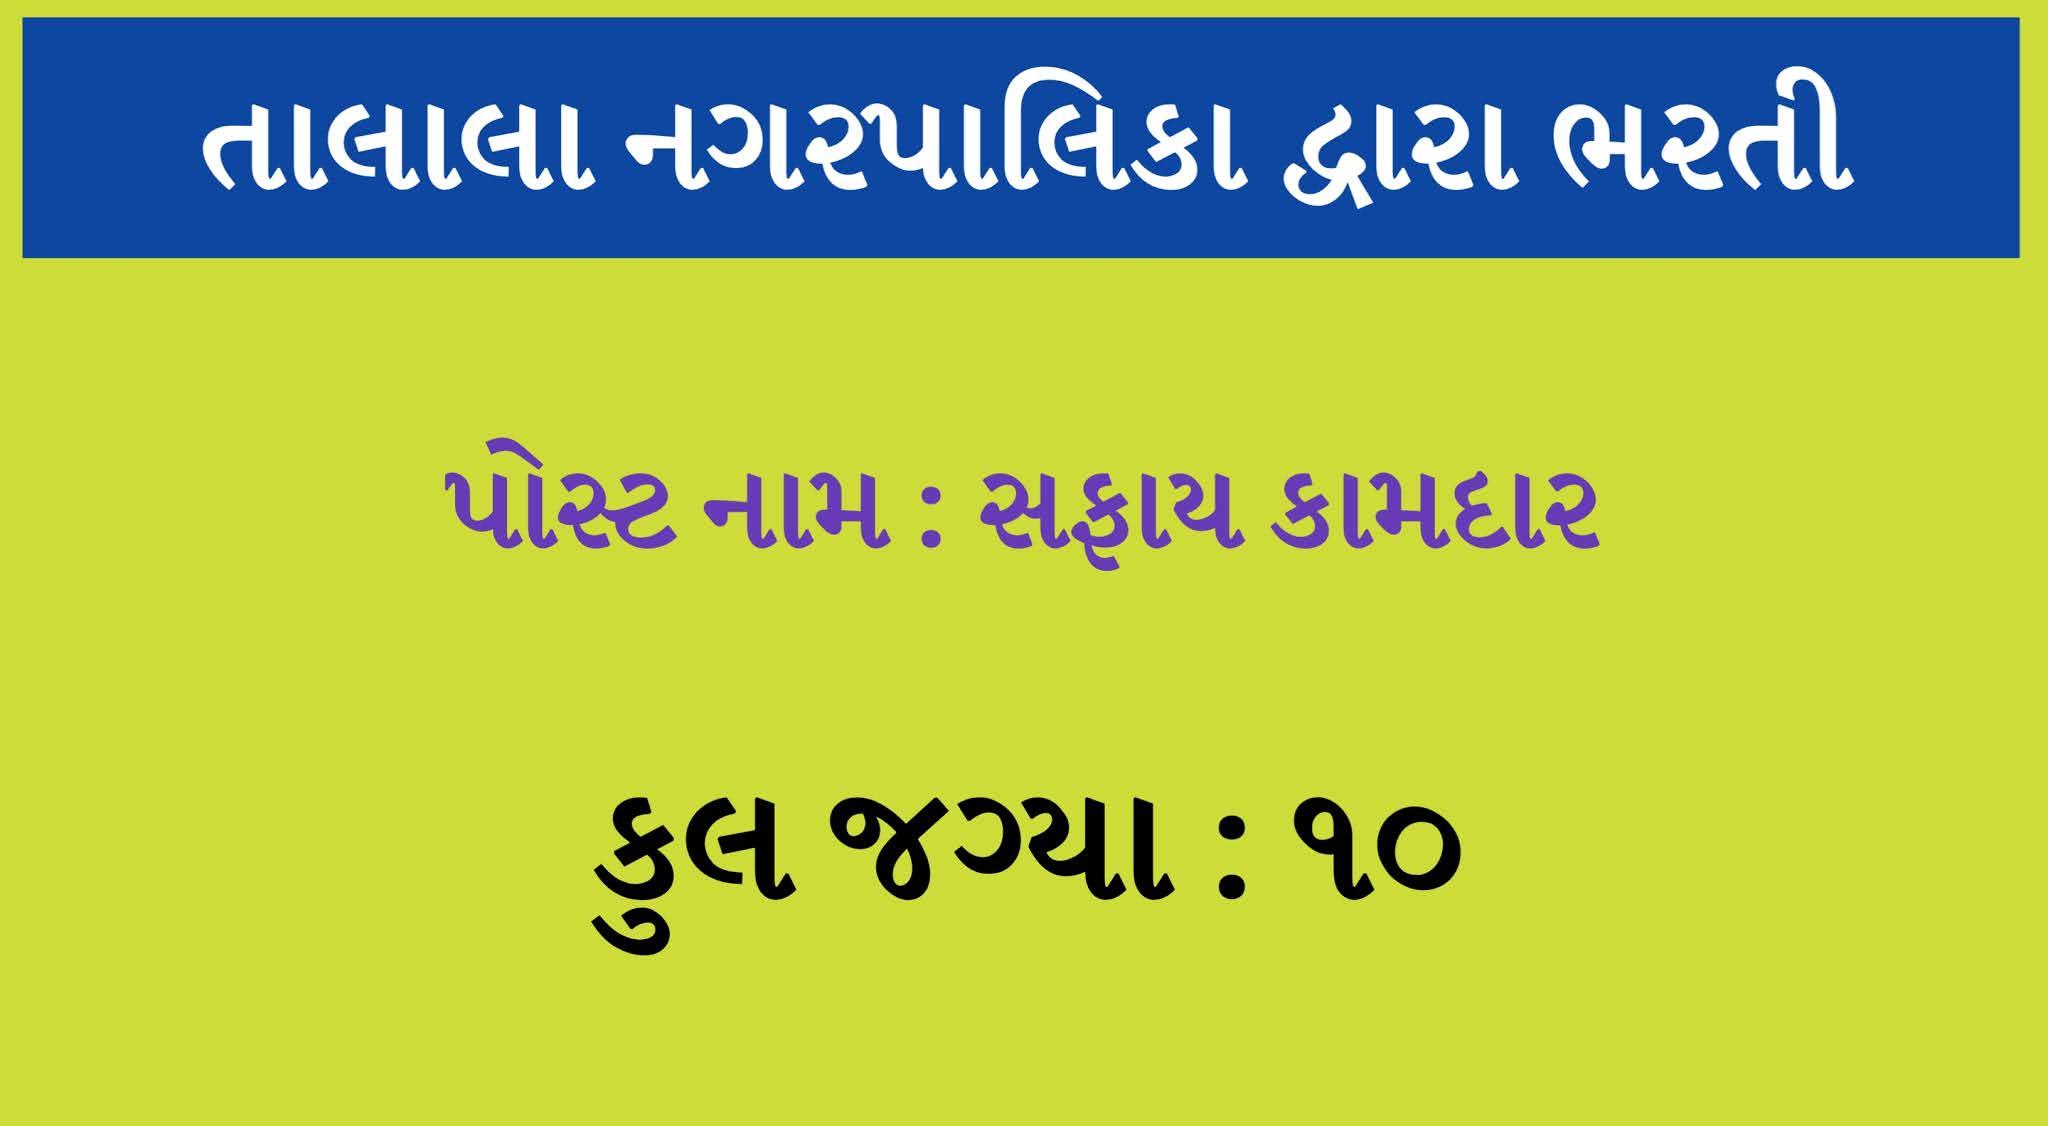 Gujarat Nagarpalika Recruitment 2021 | Talala Nagarpalika Safai Kamdar Post 2021 | Talala Nagarpalika Safai Kamdar Recruitment 2021 | Nagarpalika Safai Kamdar Recruitment 2021 | Nagarpalika Recruitment 2021 | Safai Kamdar Recruitment 2021